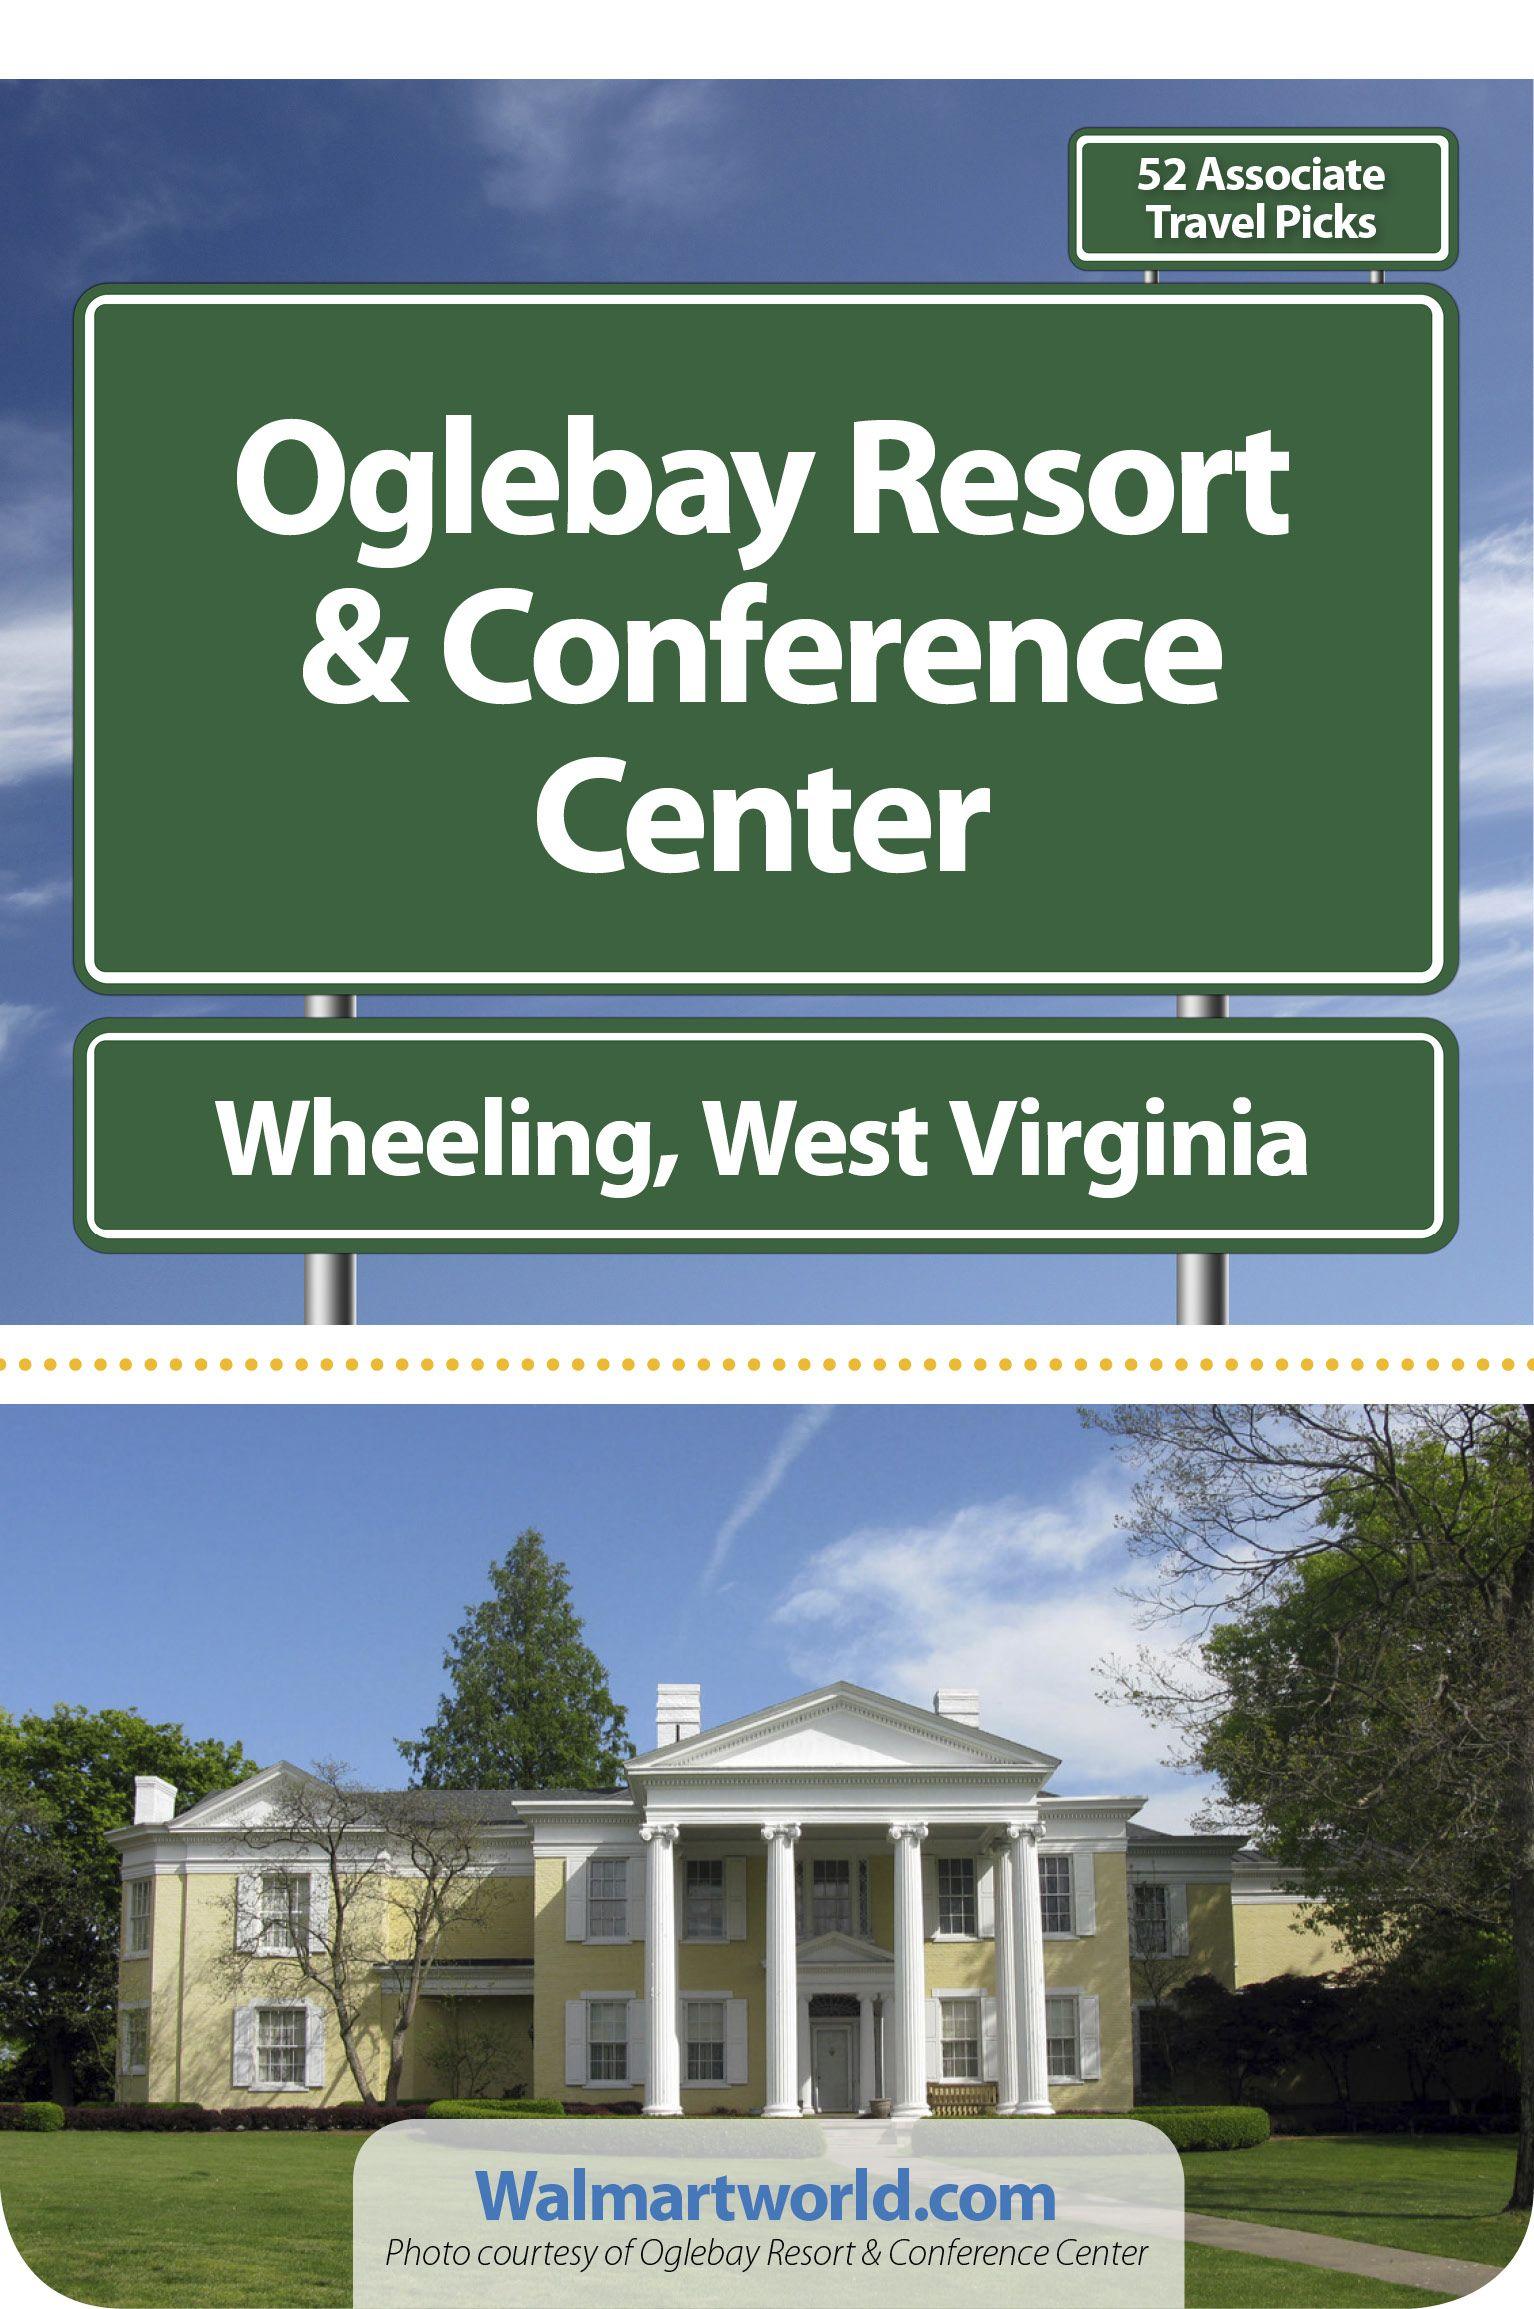 Oglebay300x204 places to get away to Pinterest